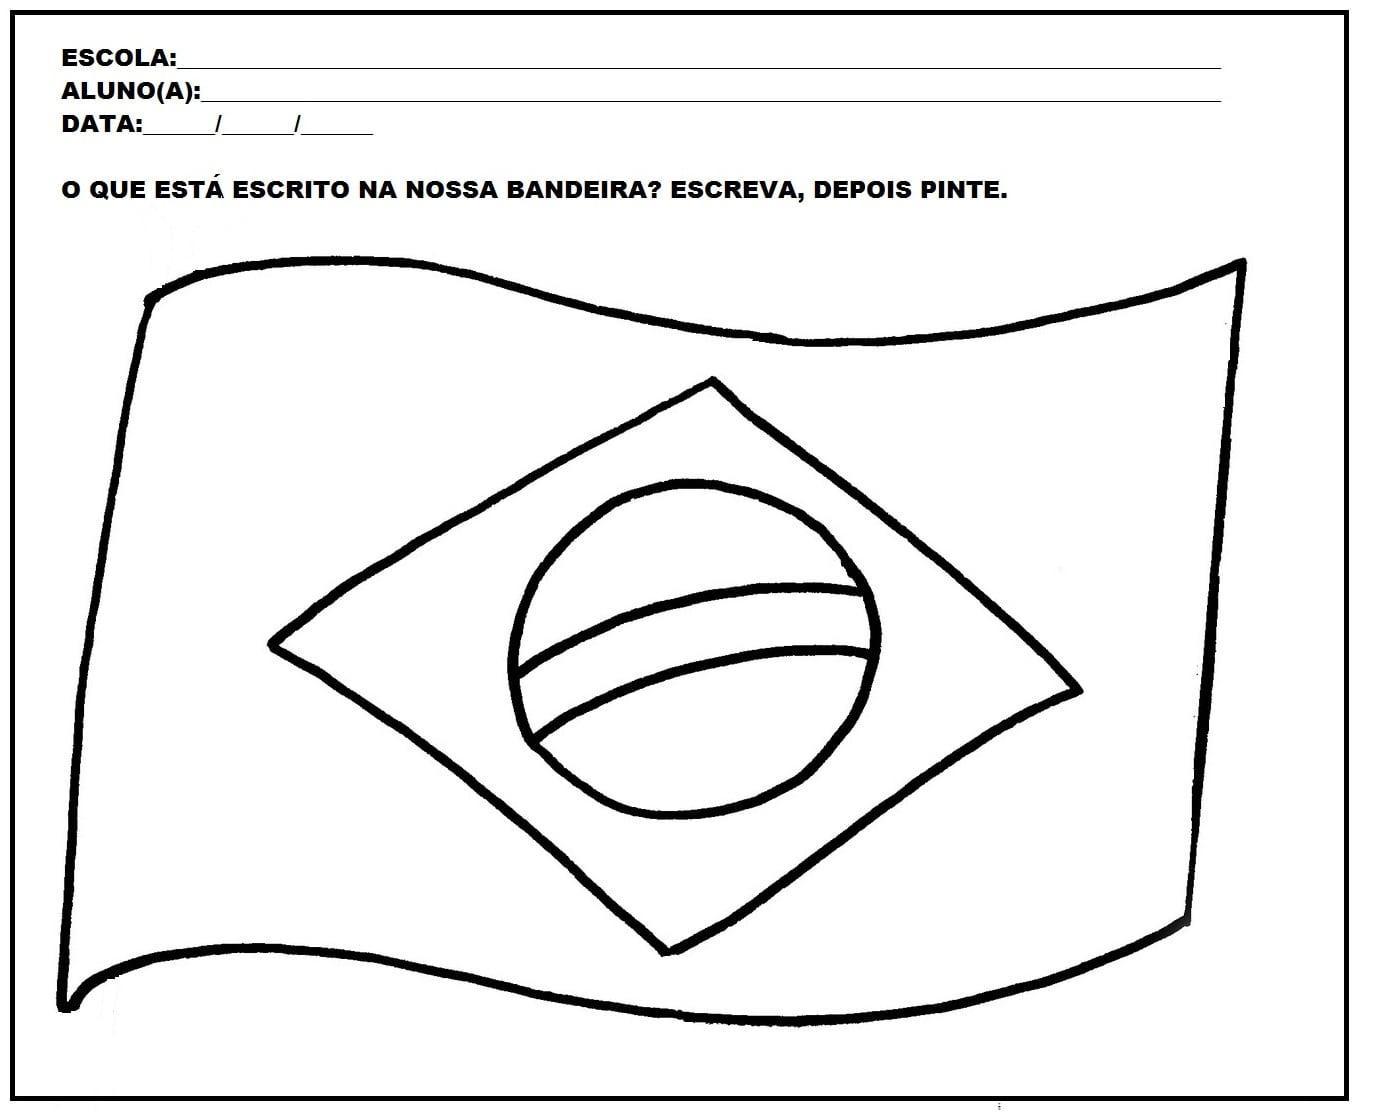 Desenho Para Colorir Da Bandeira Do Brasil